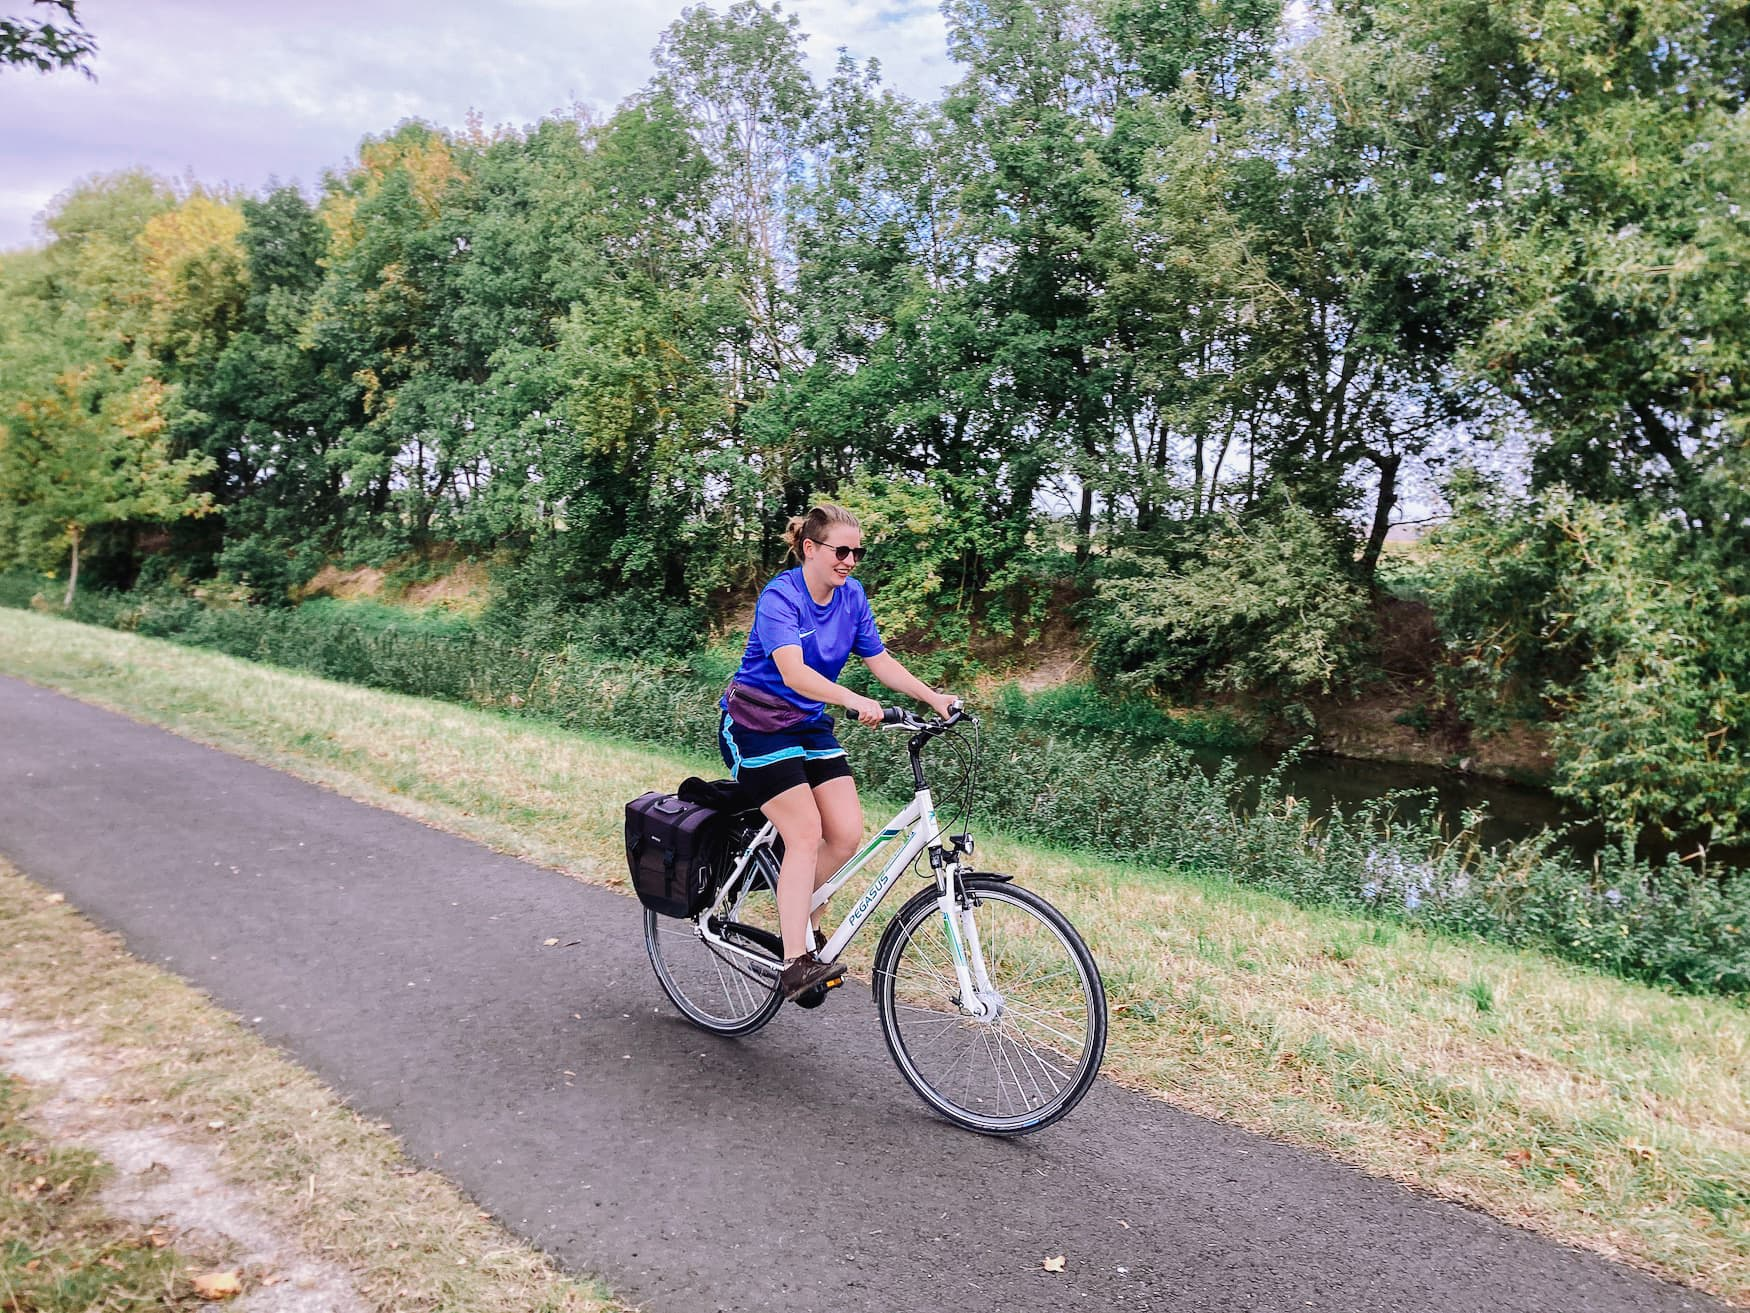 Redakteurin Marie fährt auf Radweg in Thüringen